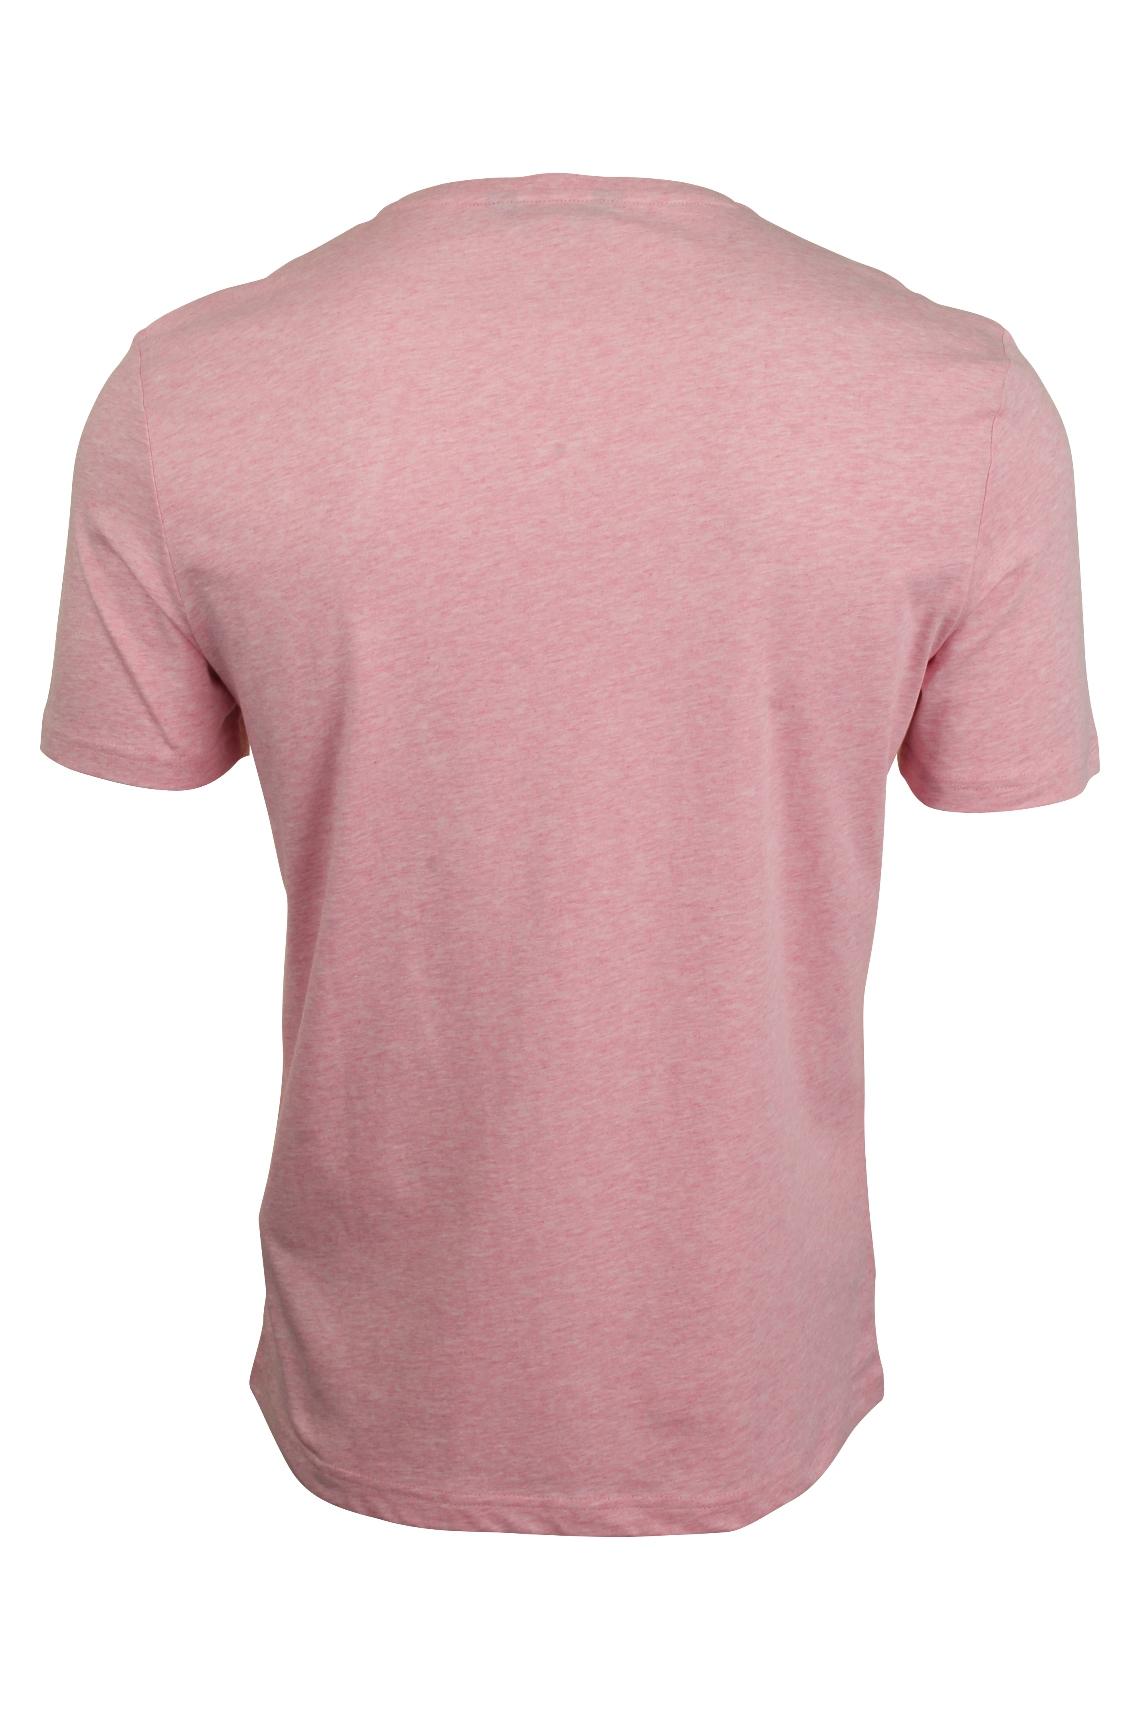 Mens-Classic-Spade-Pocket-T-Shirt-by-Ben-Sherman thumbnail 28